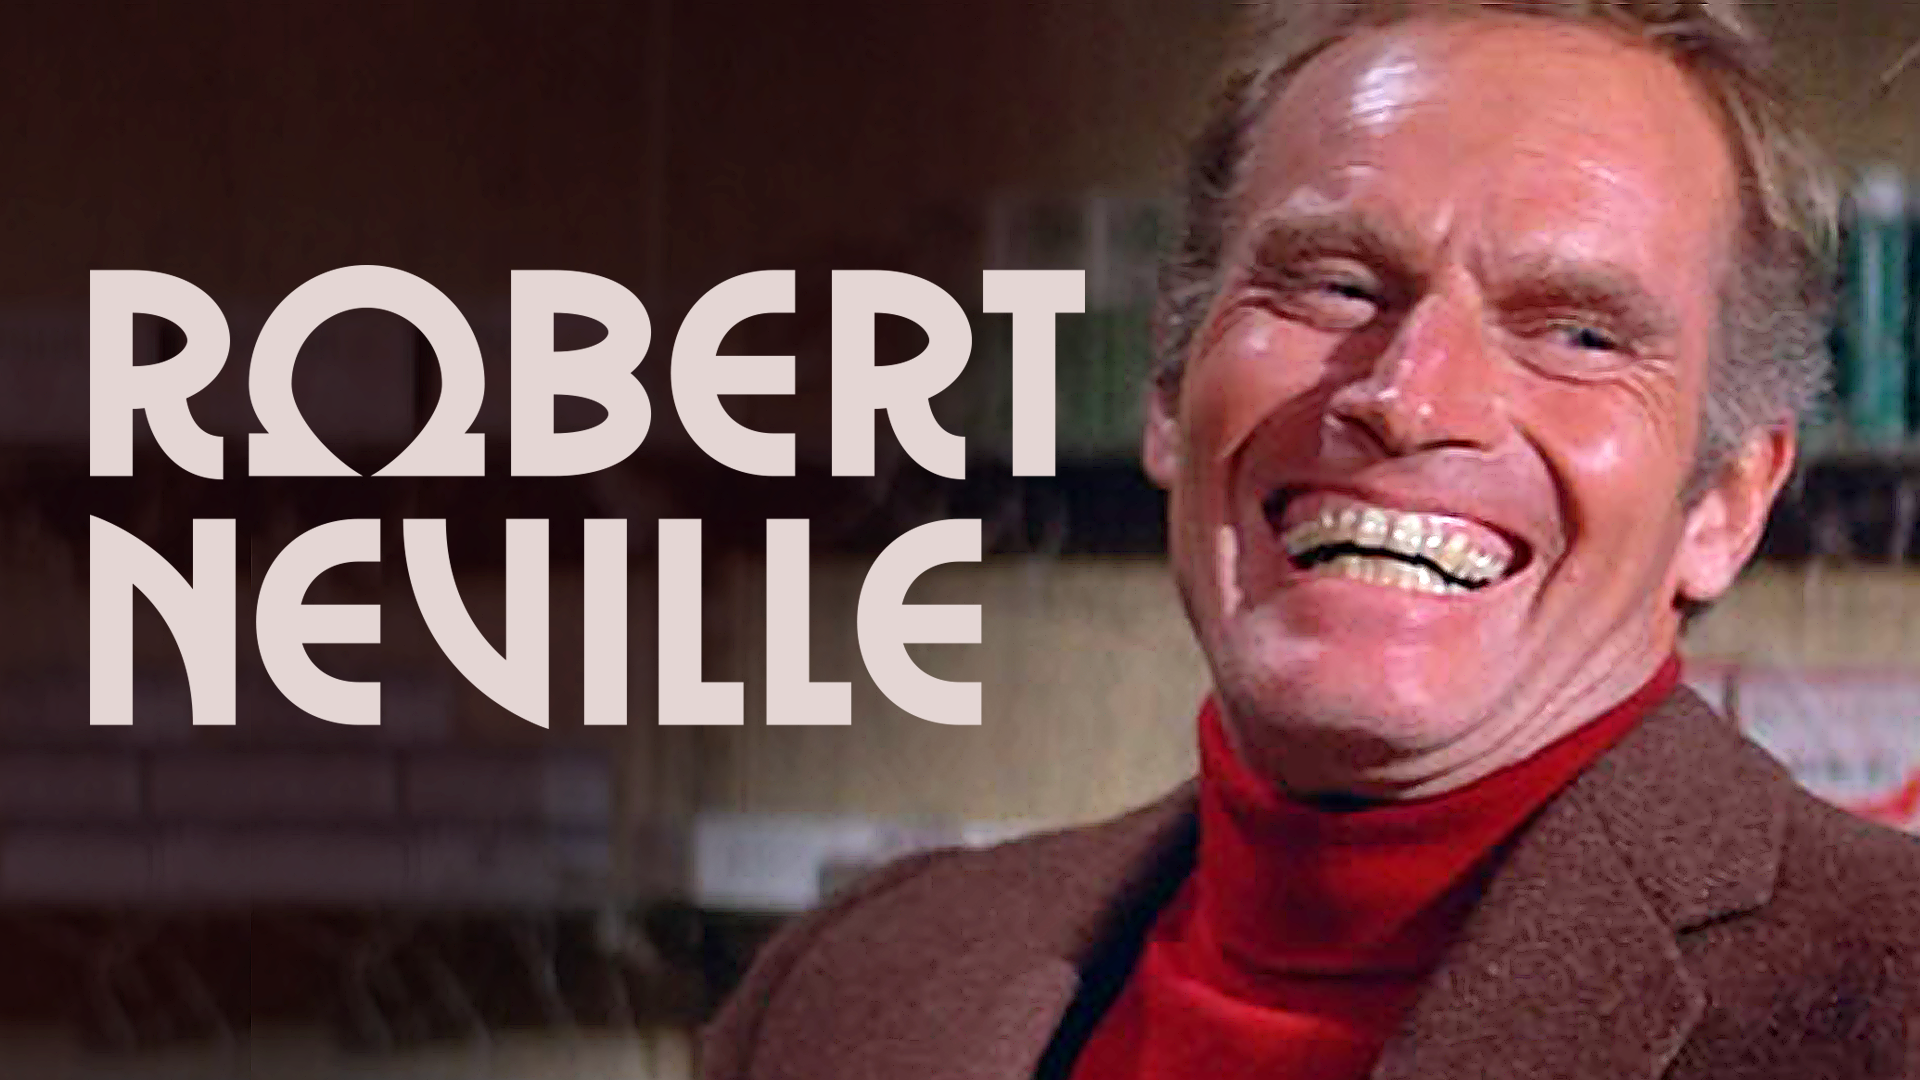 Download Robert Neville Cool Free fonts